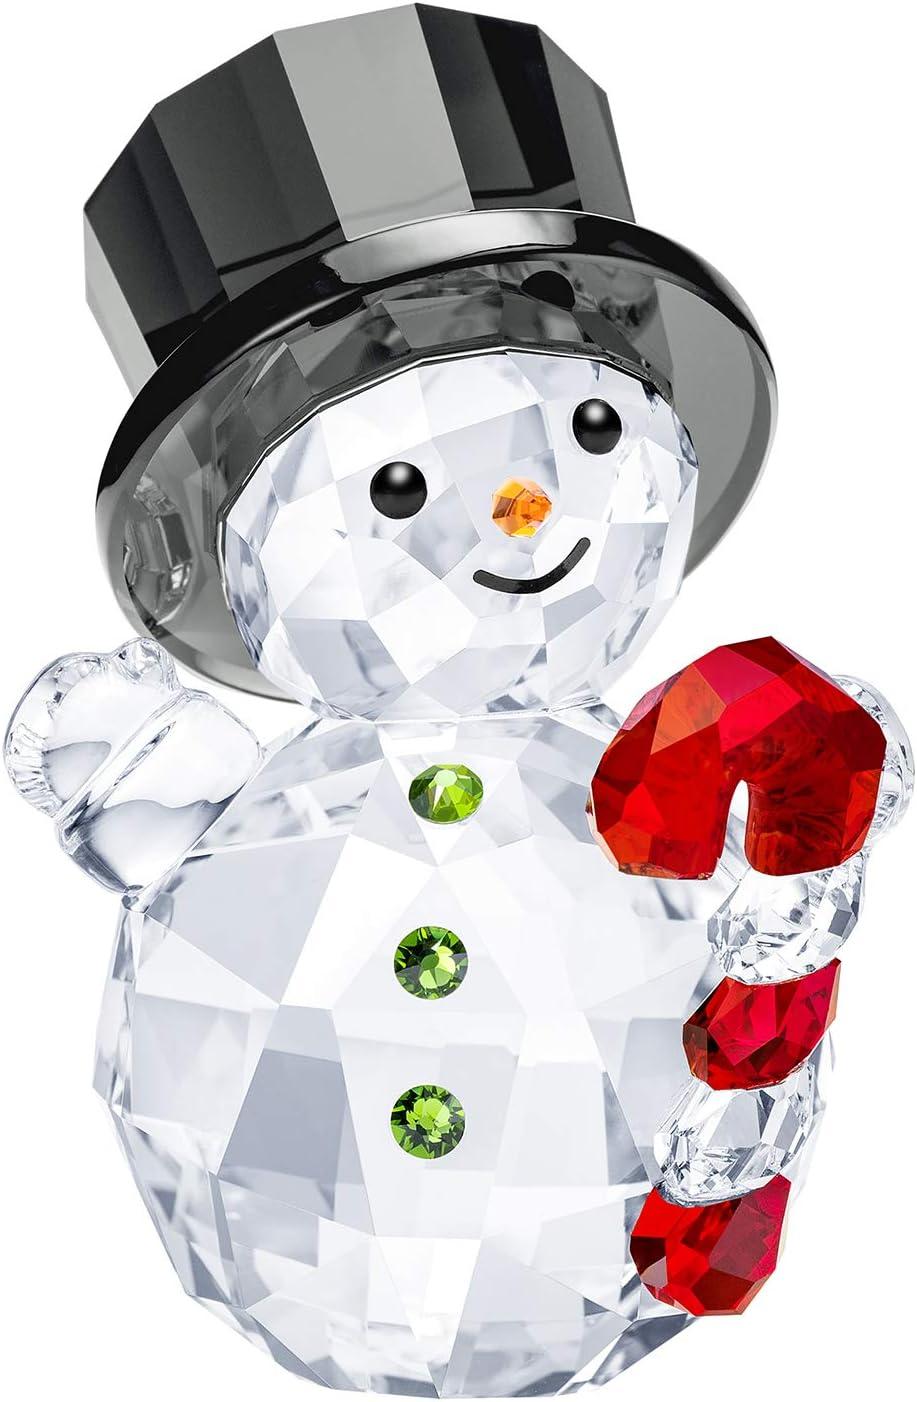 SWAROVSKI Authentic Merry and Festive Joyful Figurines Snowman with Candy Cane